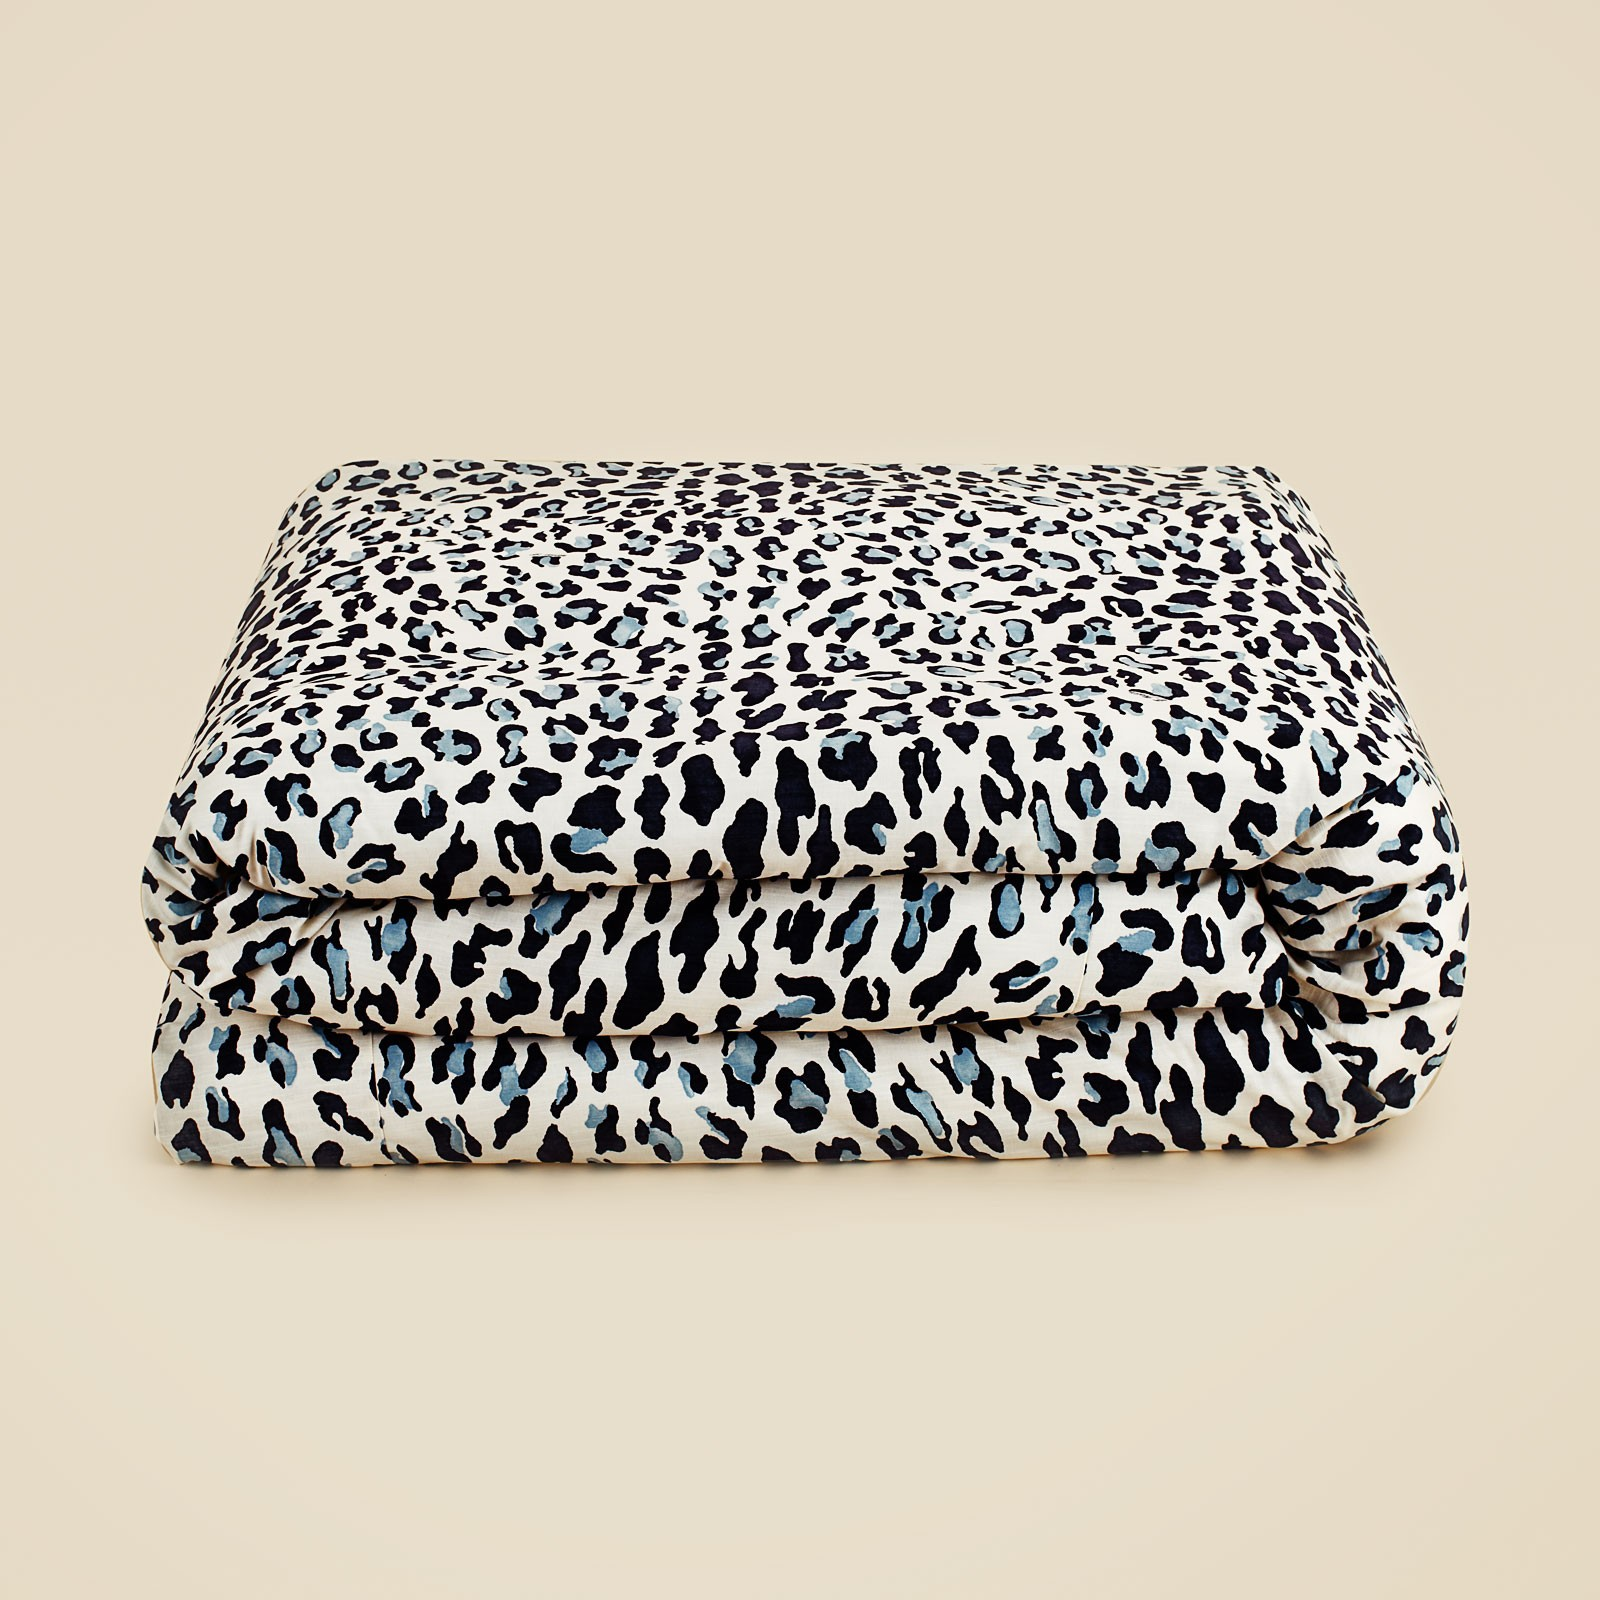 Edmond Frette Leopard Print Queen Duvet Cover Ebay